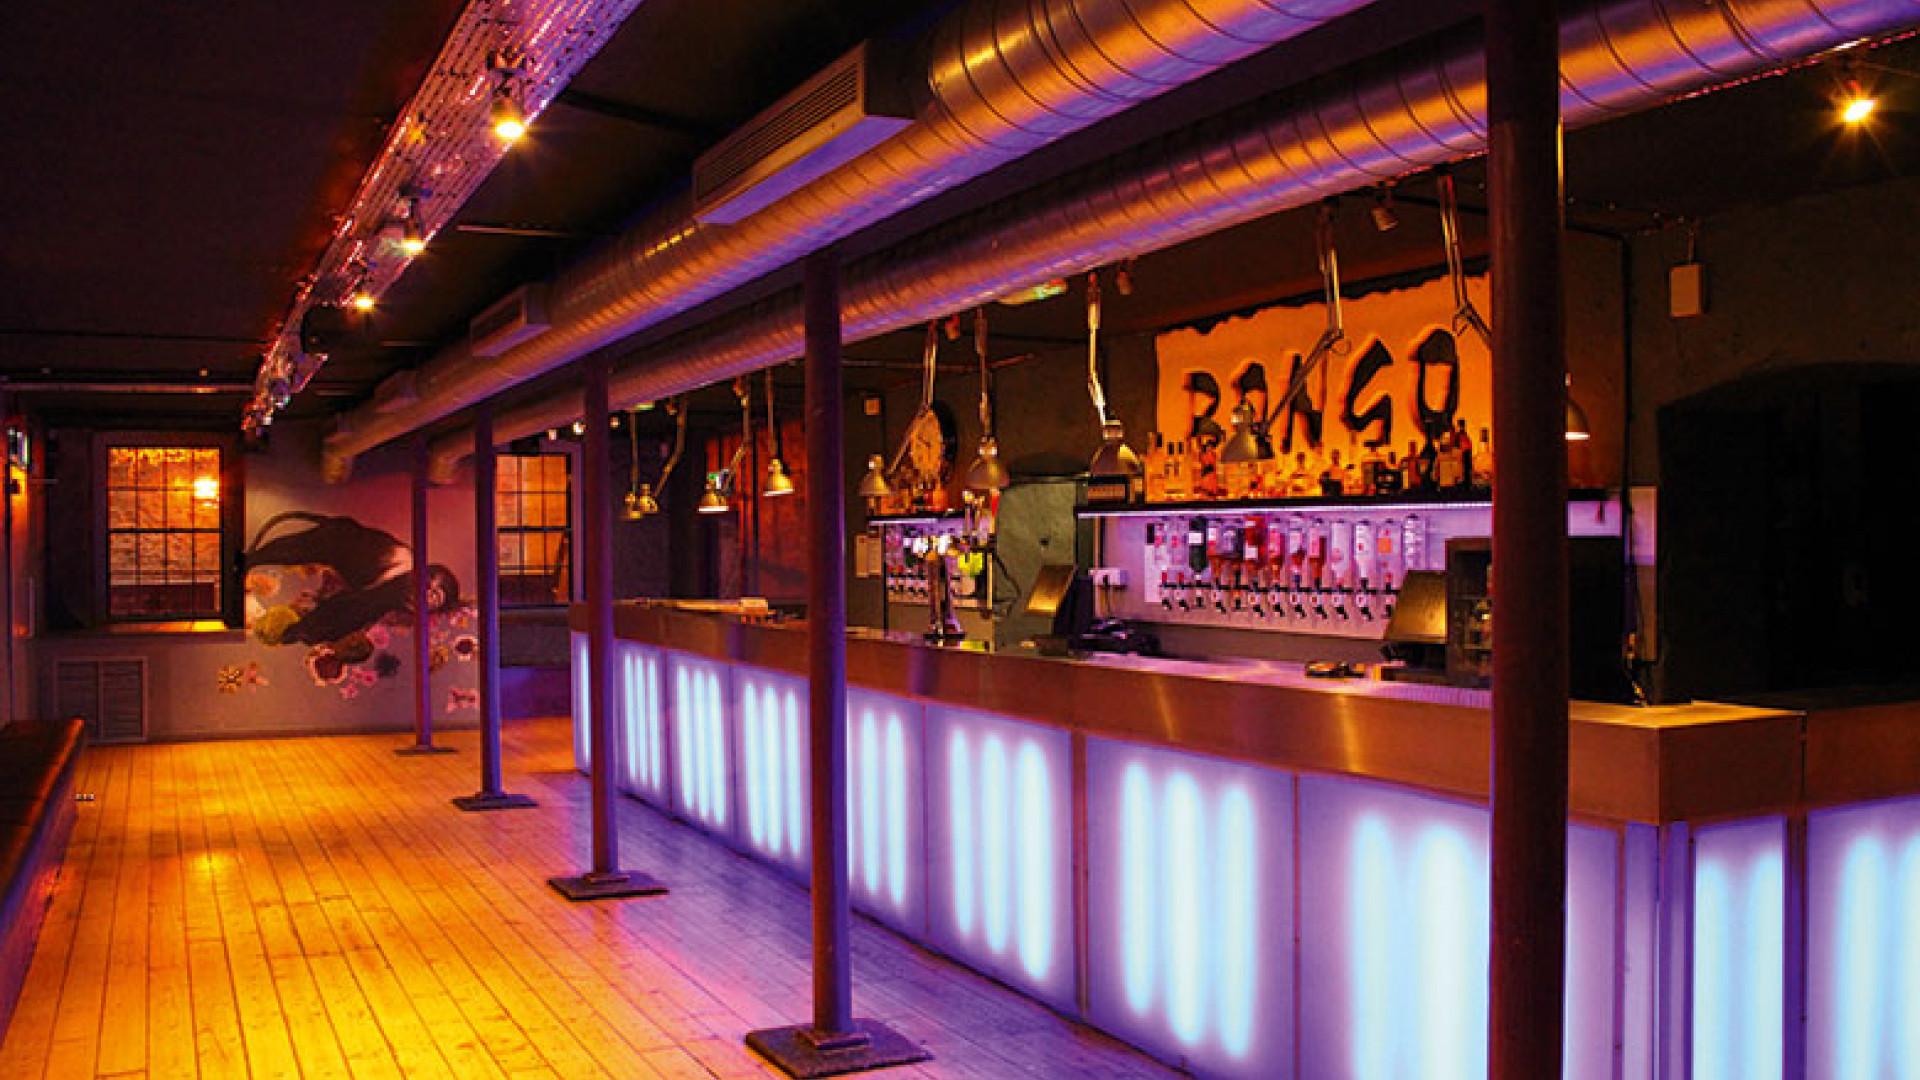 The Bongo Club Edinburgh bar